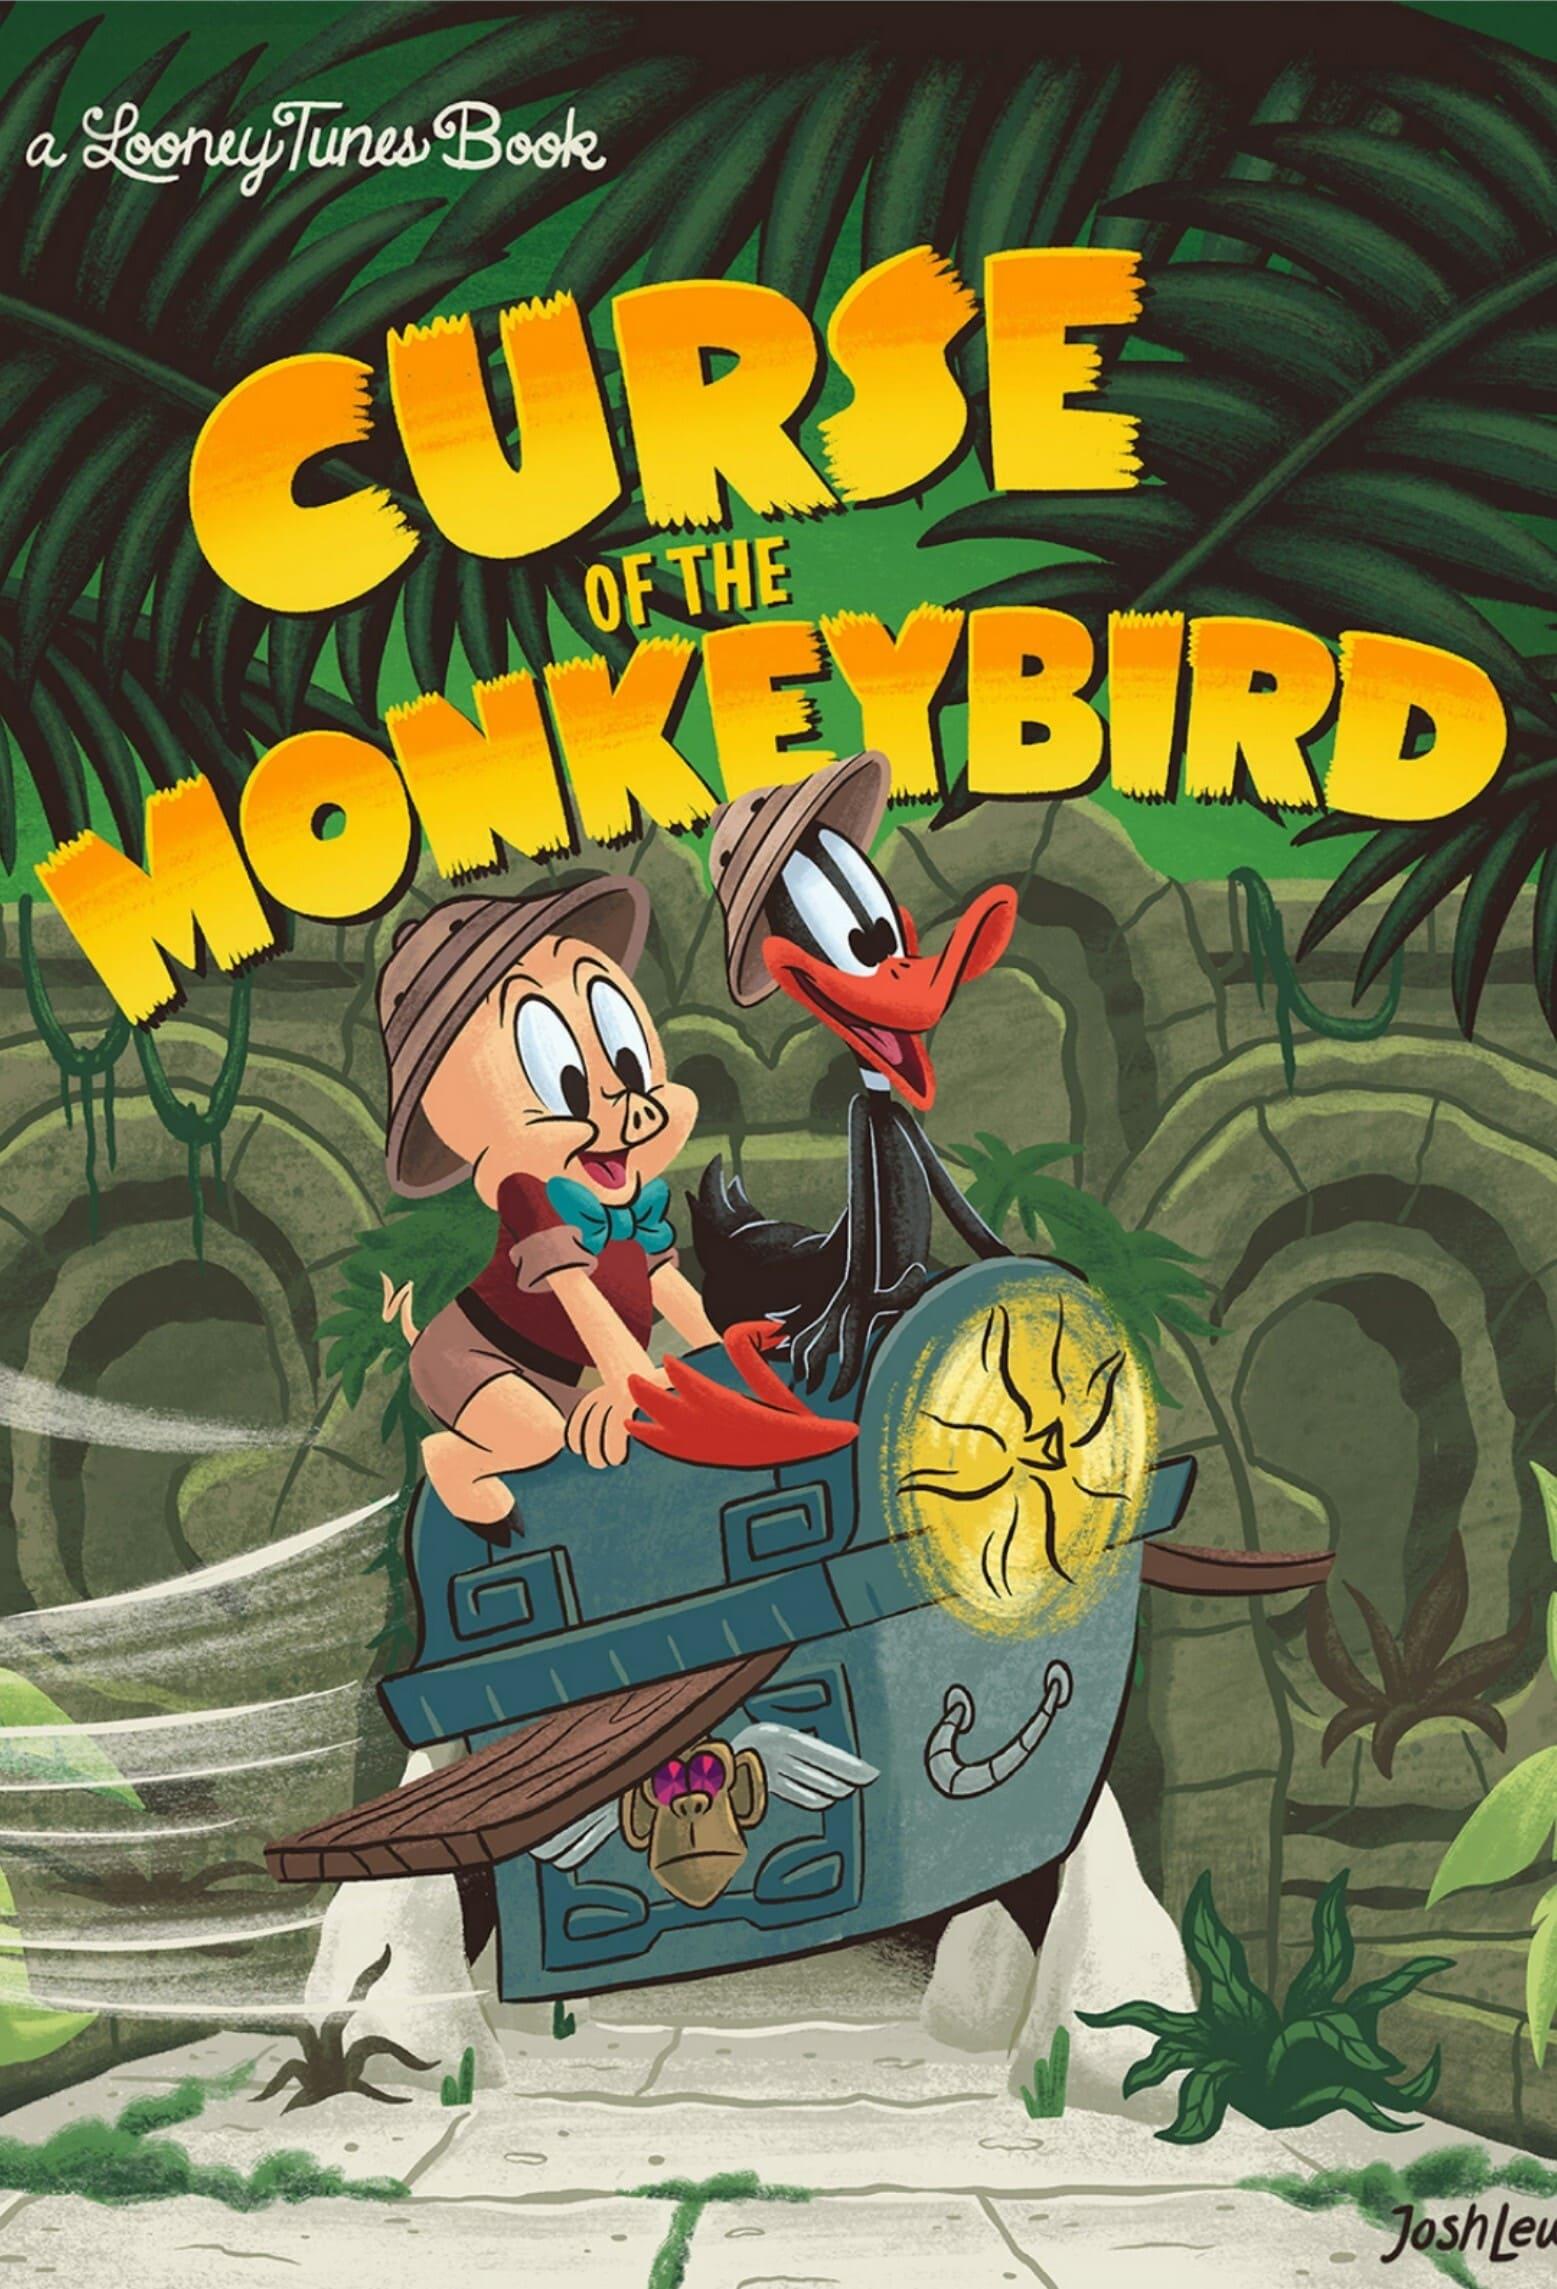 The Curse of the Monkey Bird